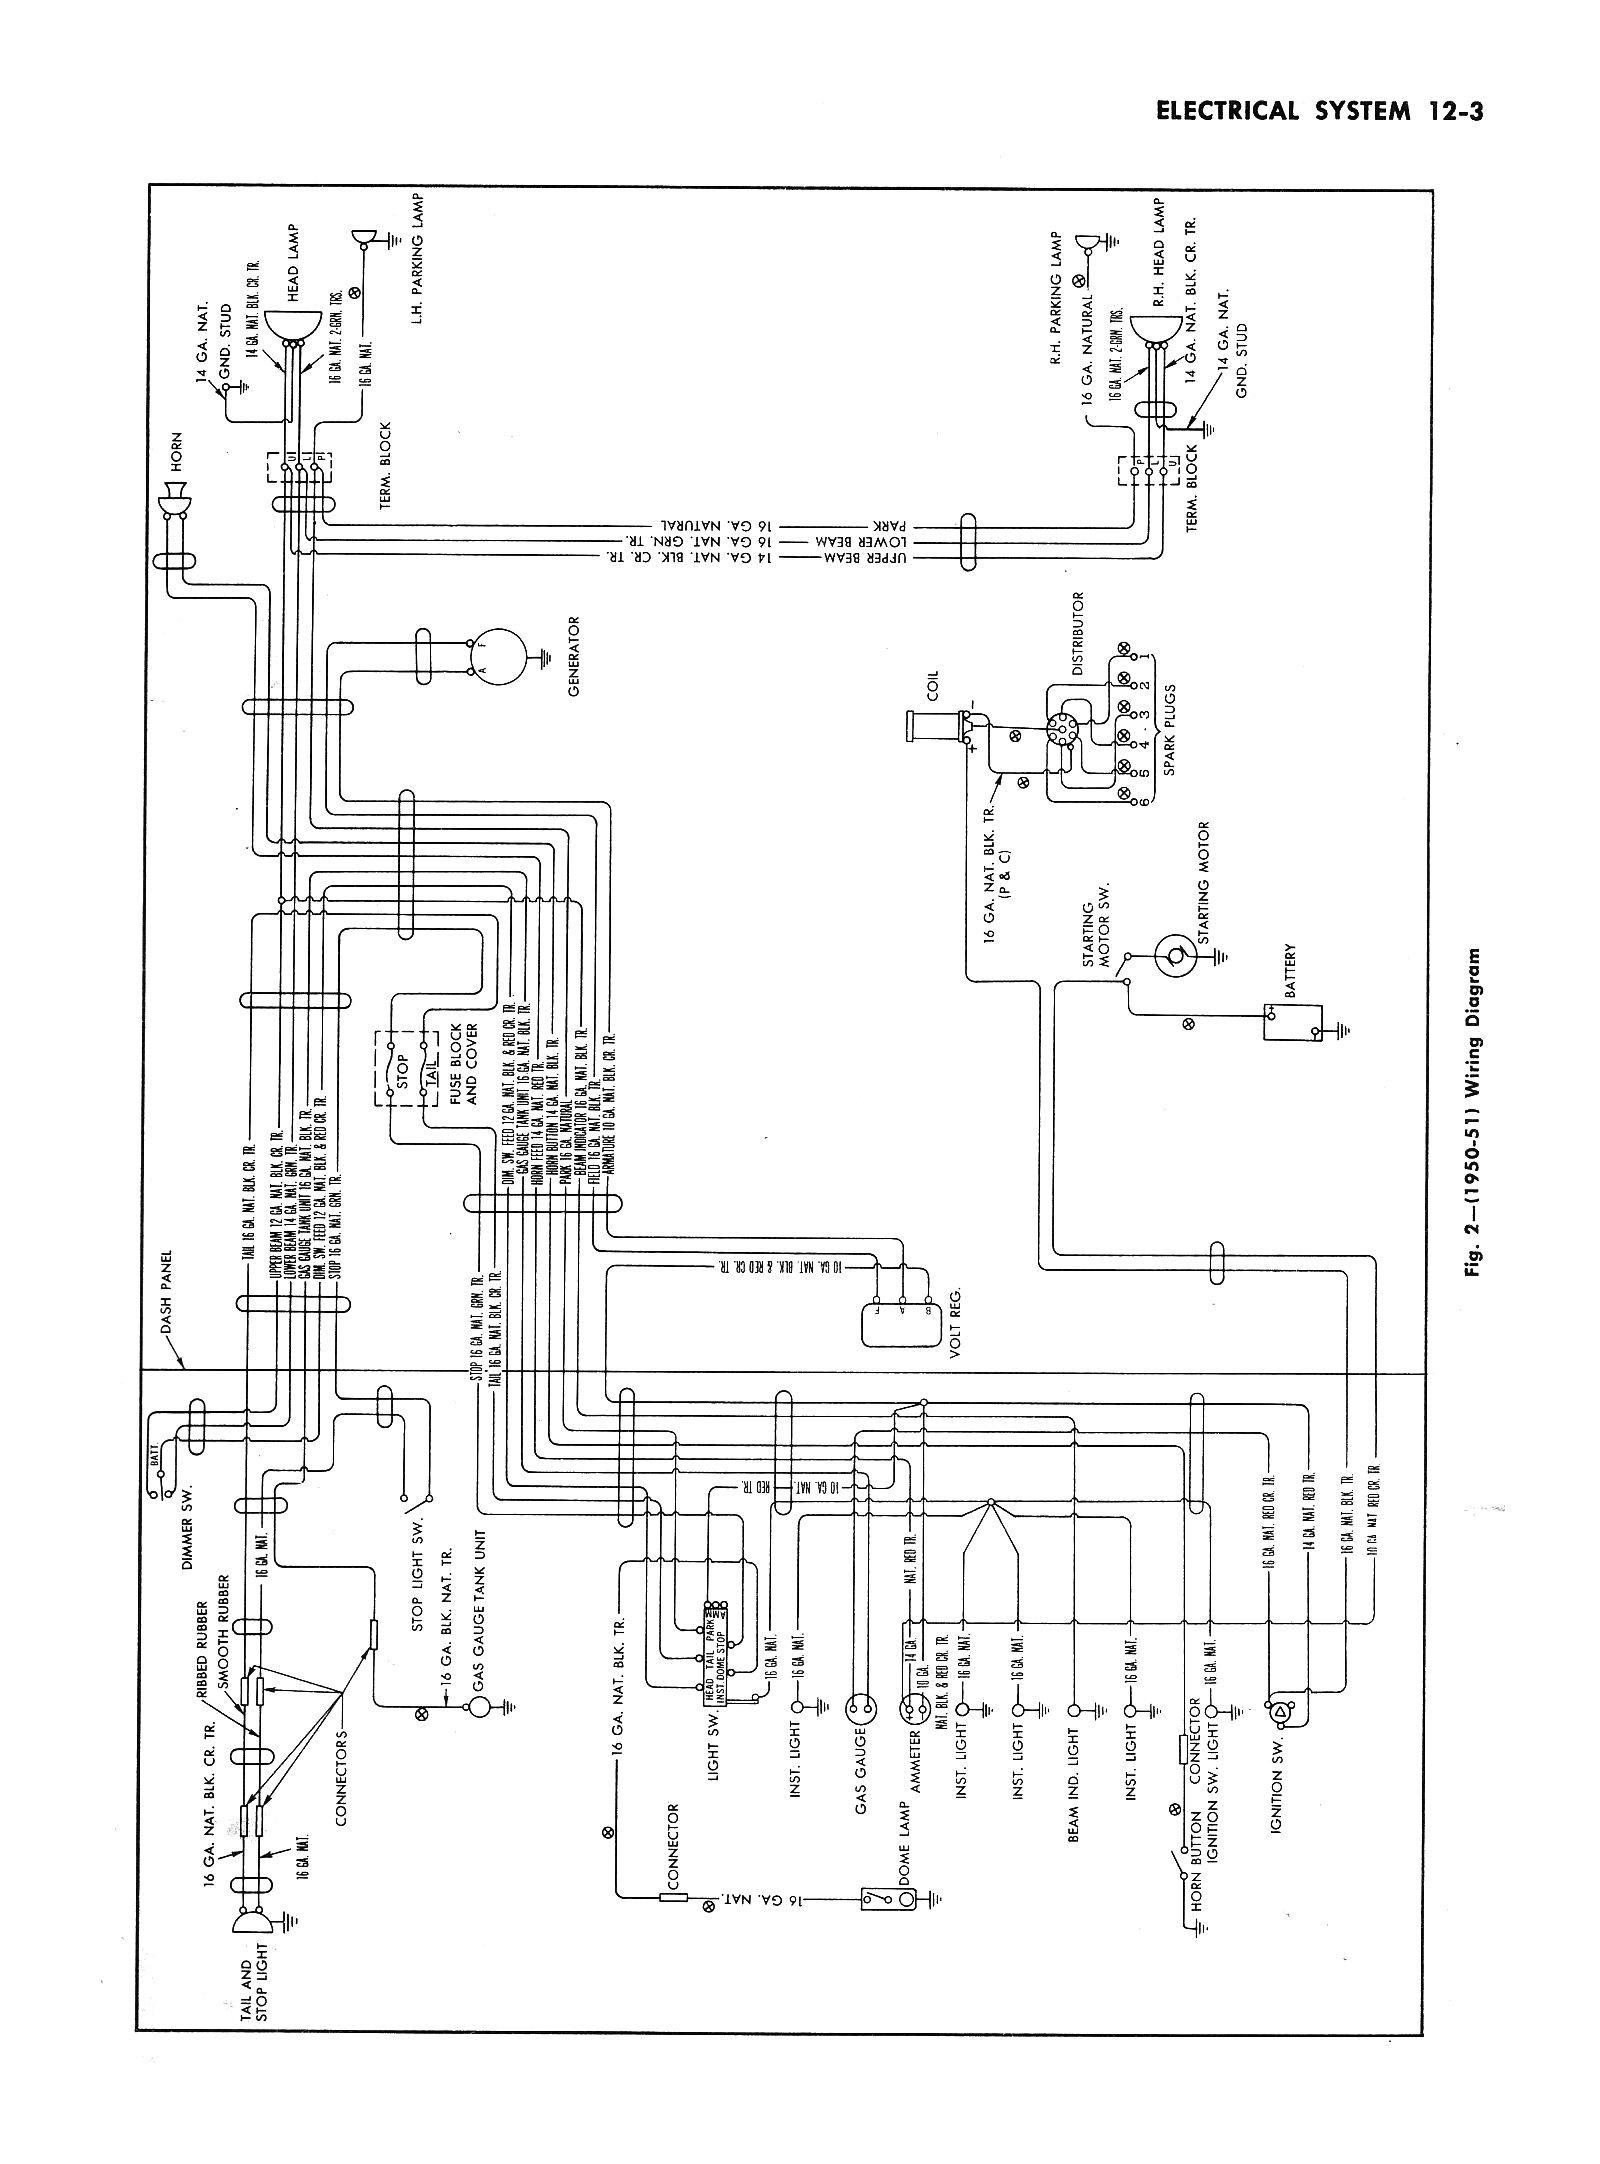 50ctsm1203?quality\\\=80\\\&strip\\\=all bd 300 utv kohler ch935 wiring diagram bulldog utv parts  at n-0.co